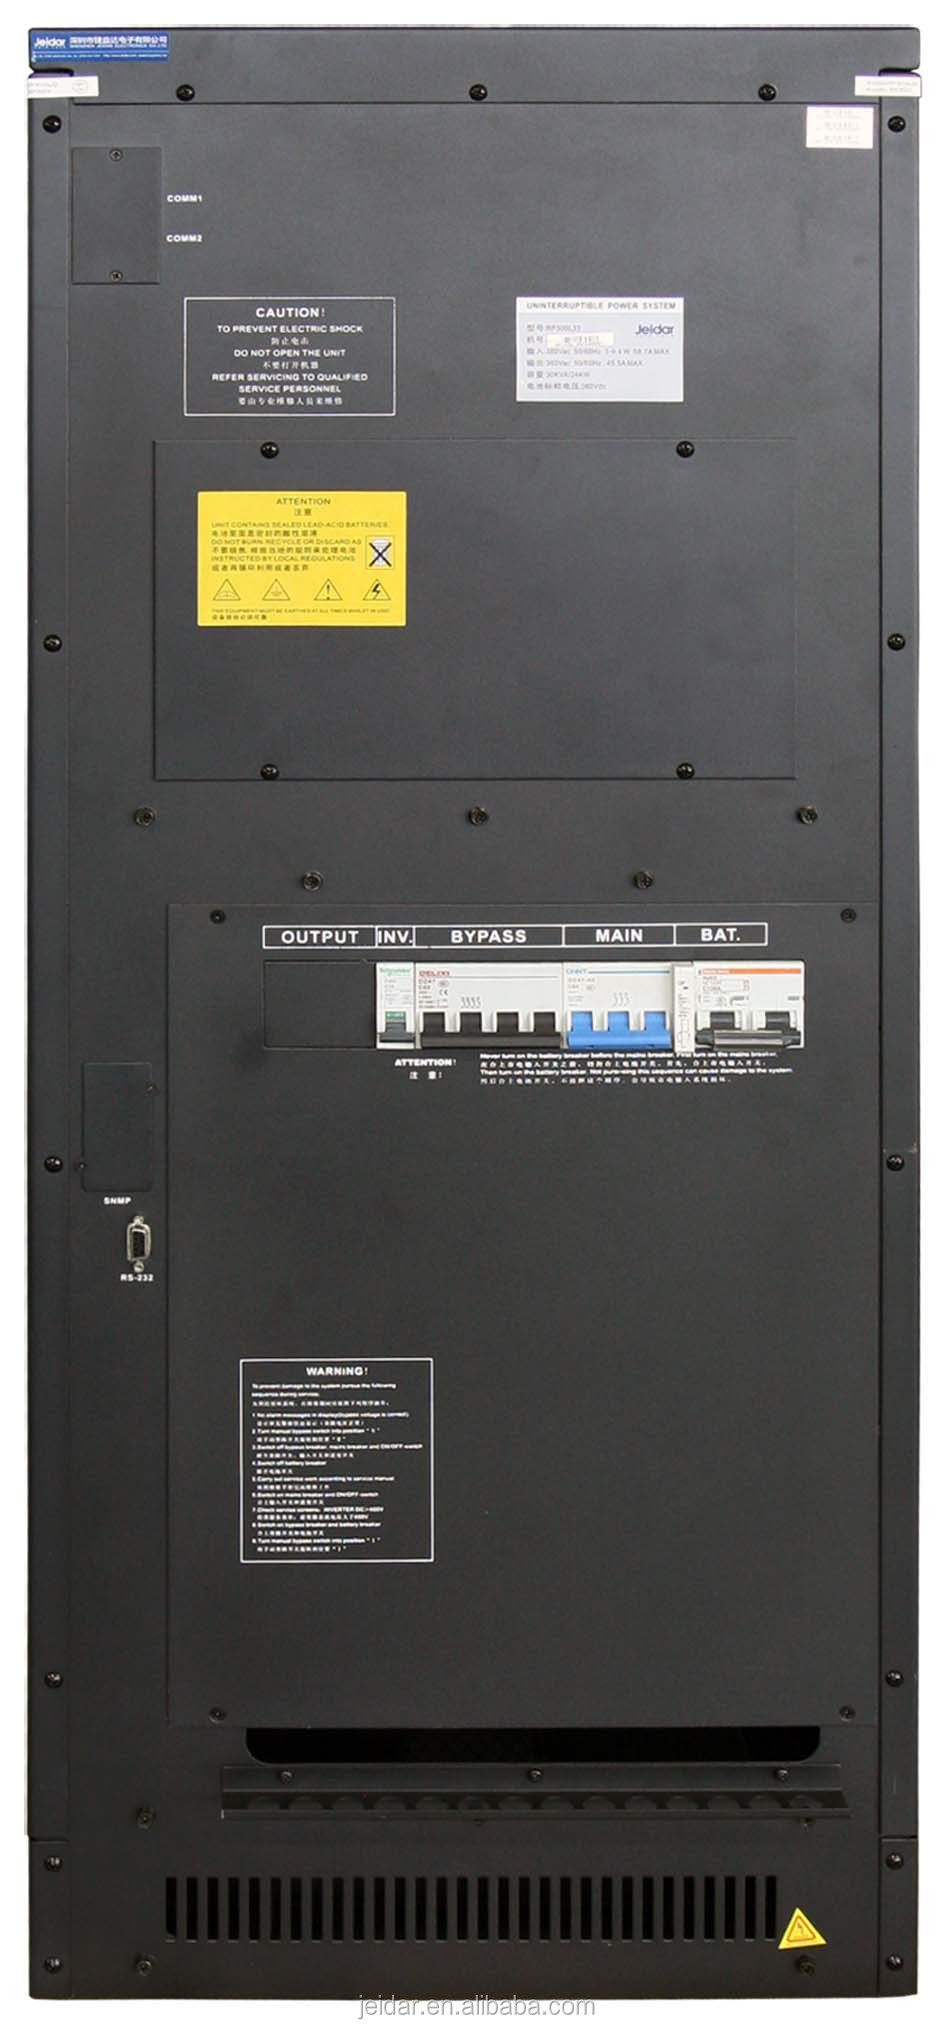 RP100.150.200.300.400L33 1.jpg